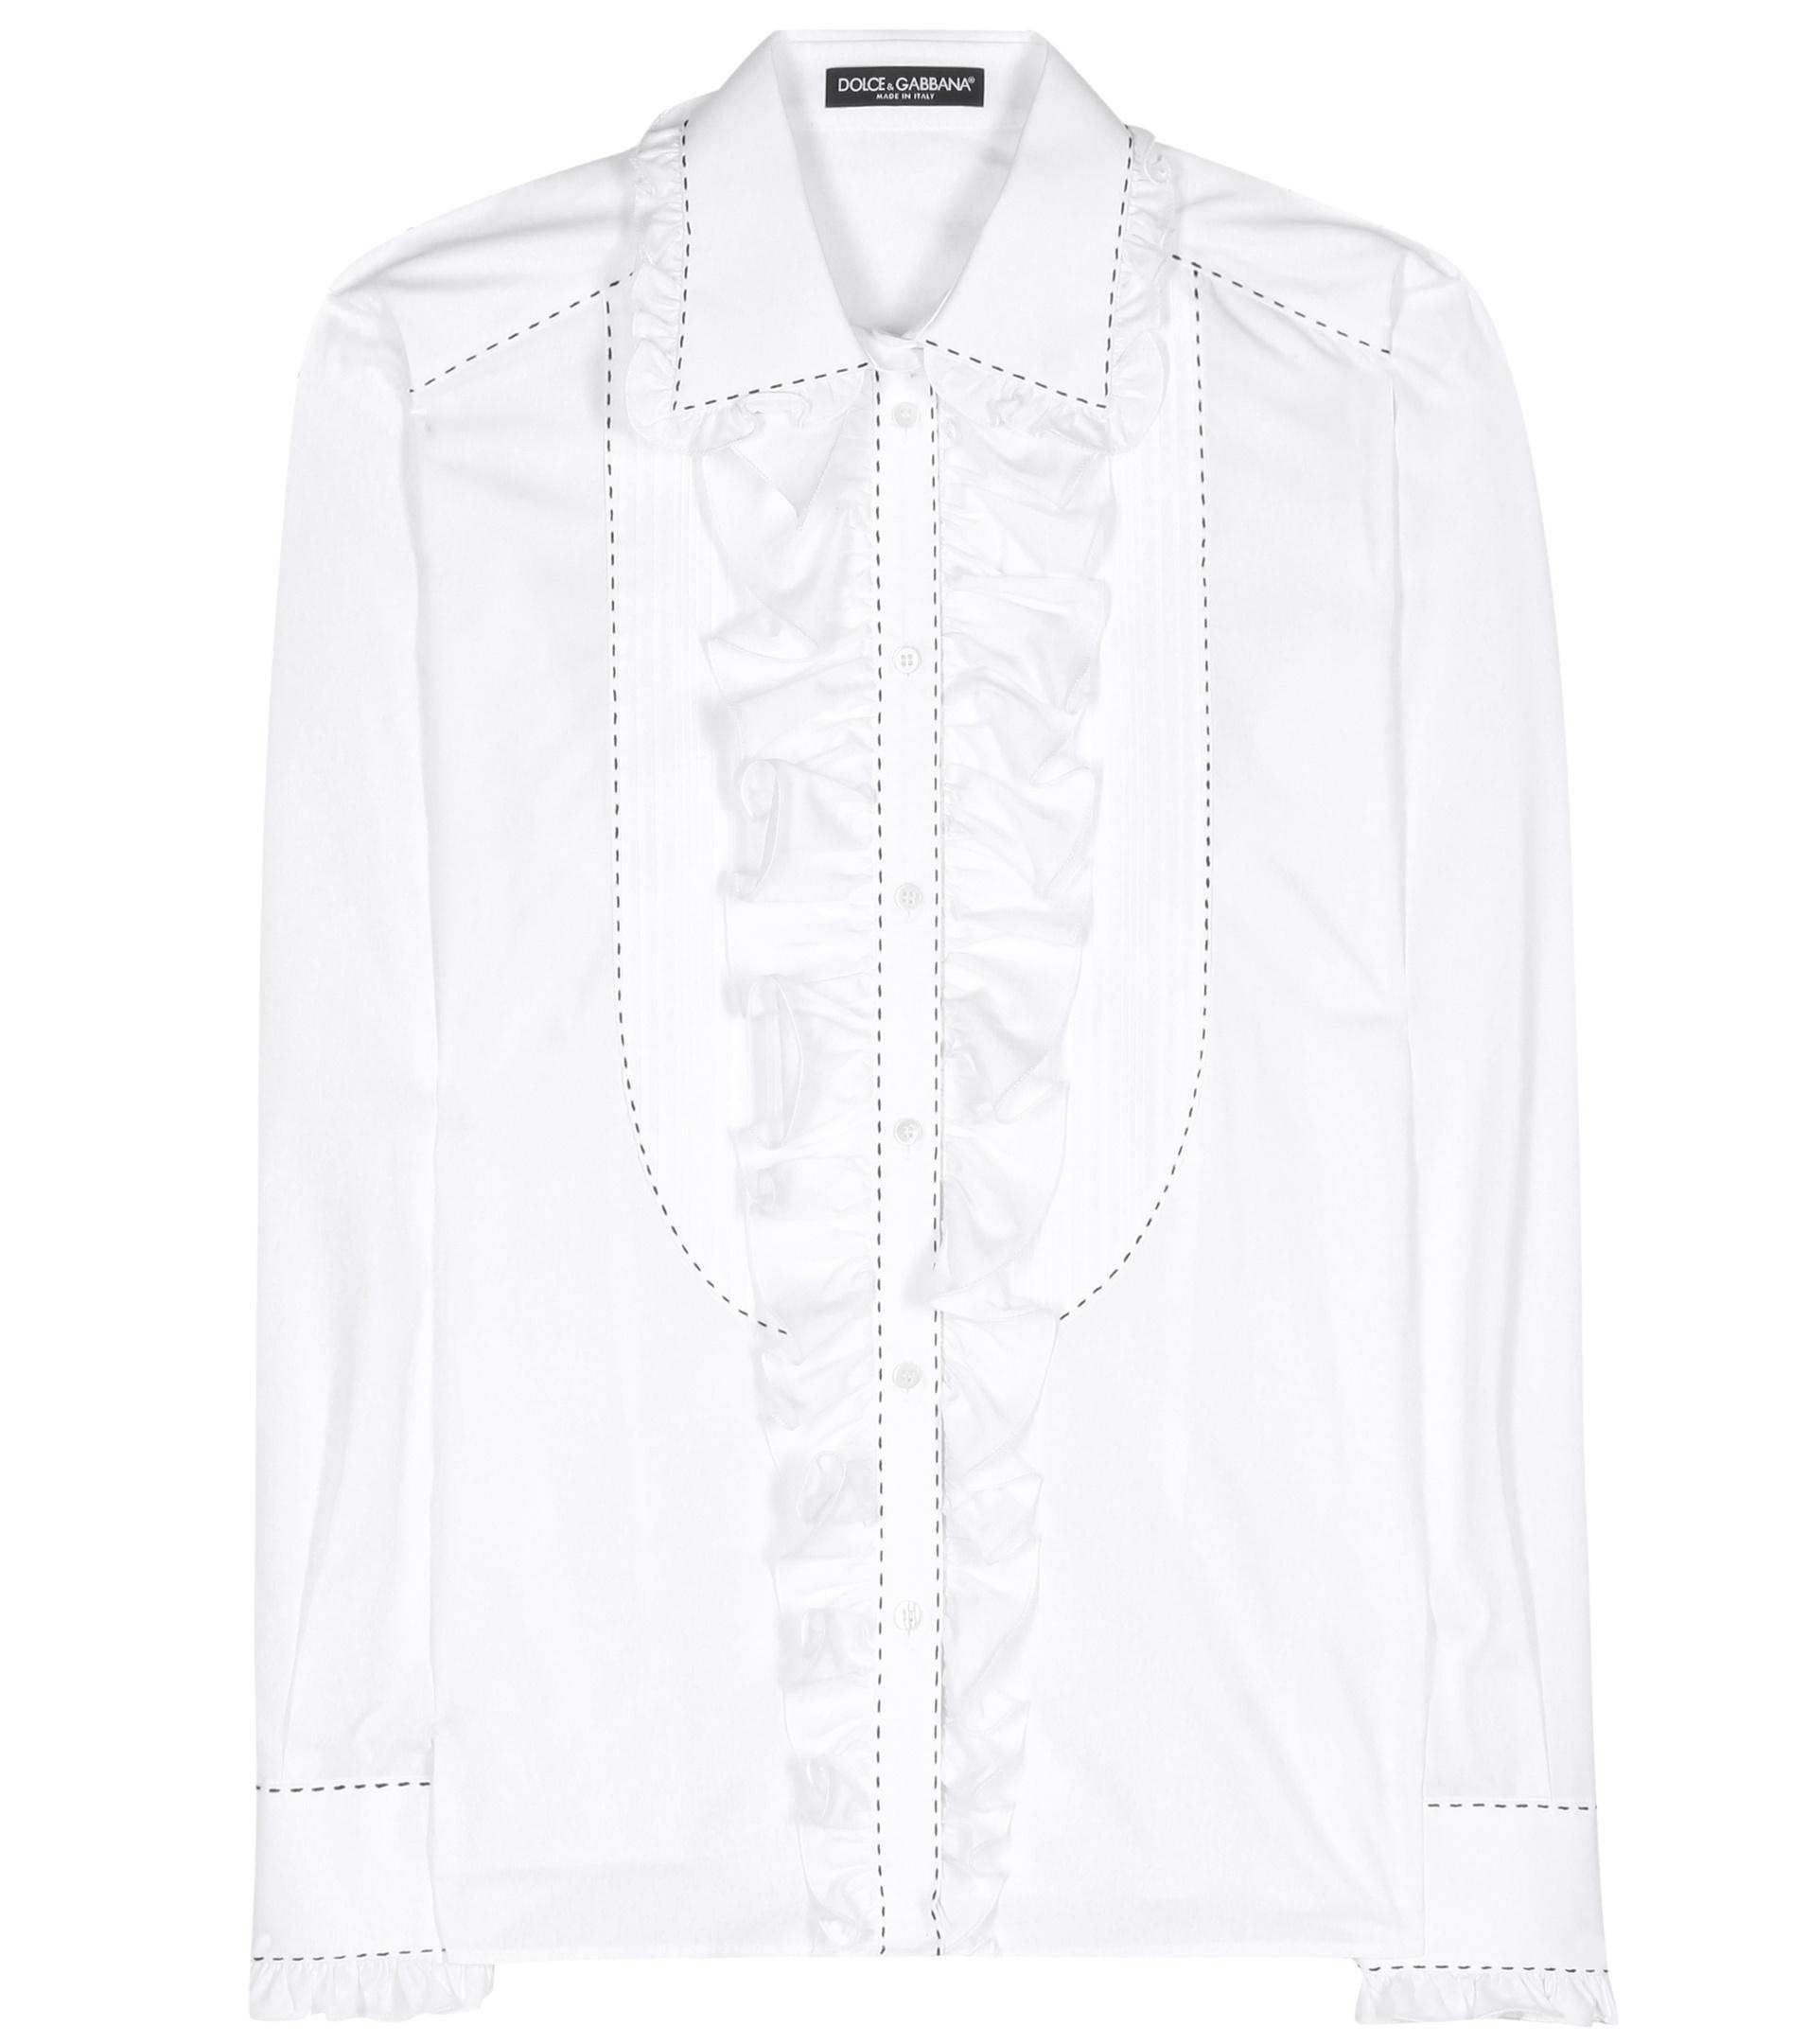 Dolce Gabbana Ruffled Cotton Shirt In White For Men Lyst